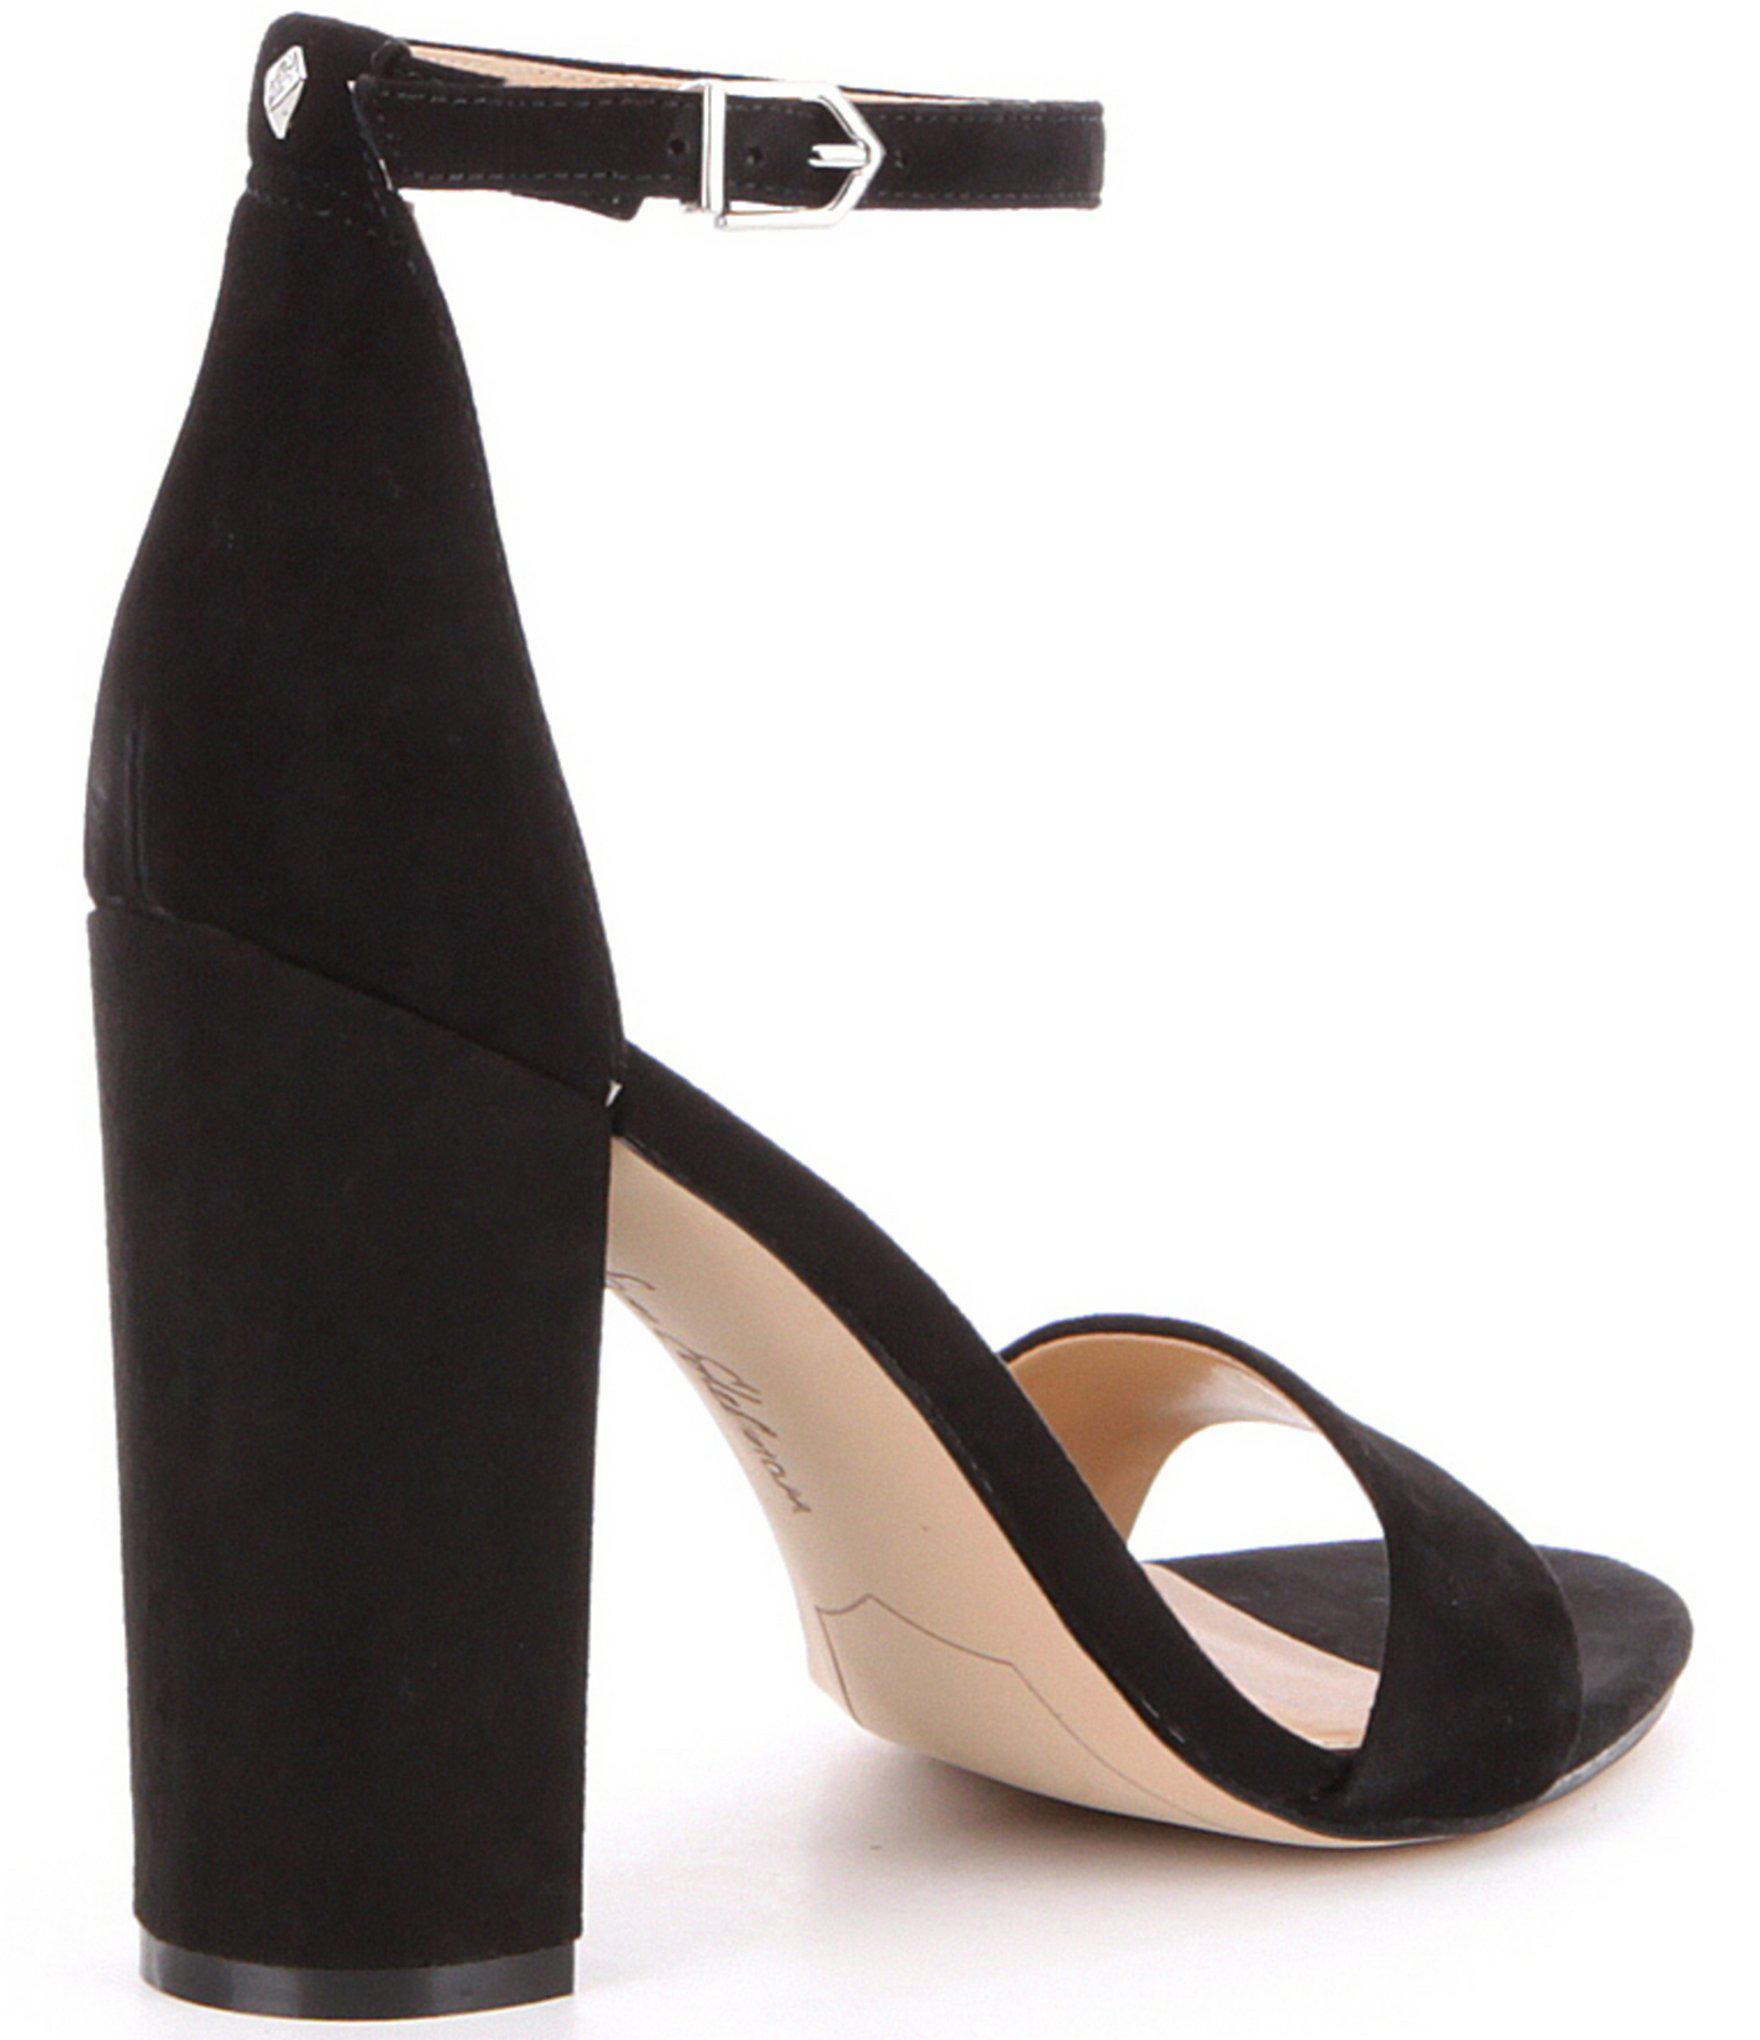 74bd20acb1f1b4 Sam Edelman - Black Yaro Suede Ankle Strap Block Heel Dress Sandals - Lyst.  View fullscreen